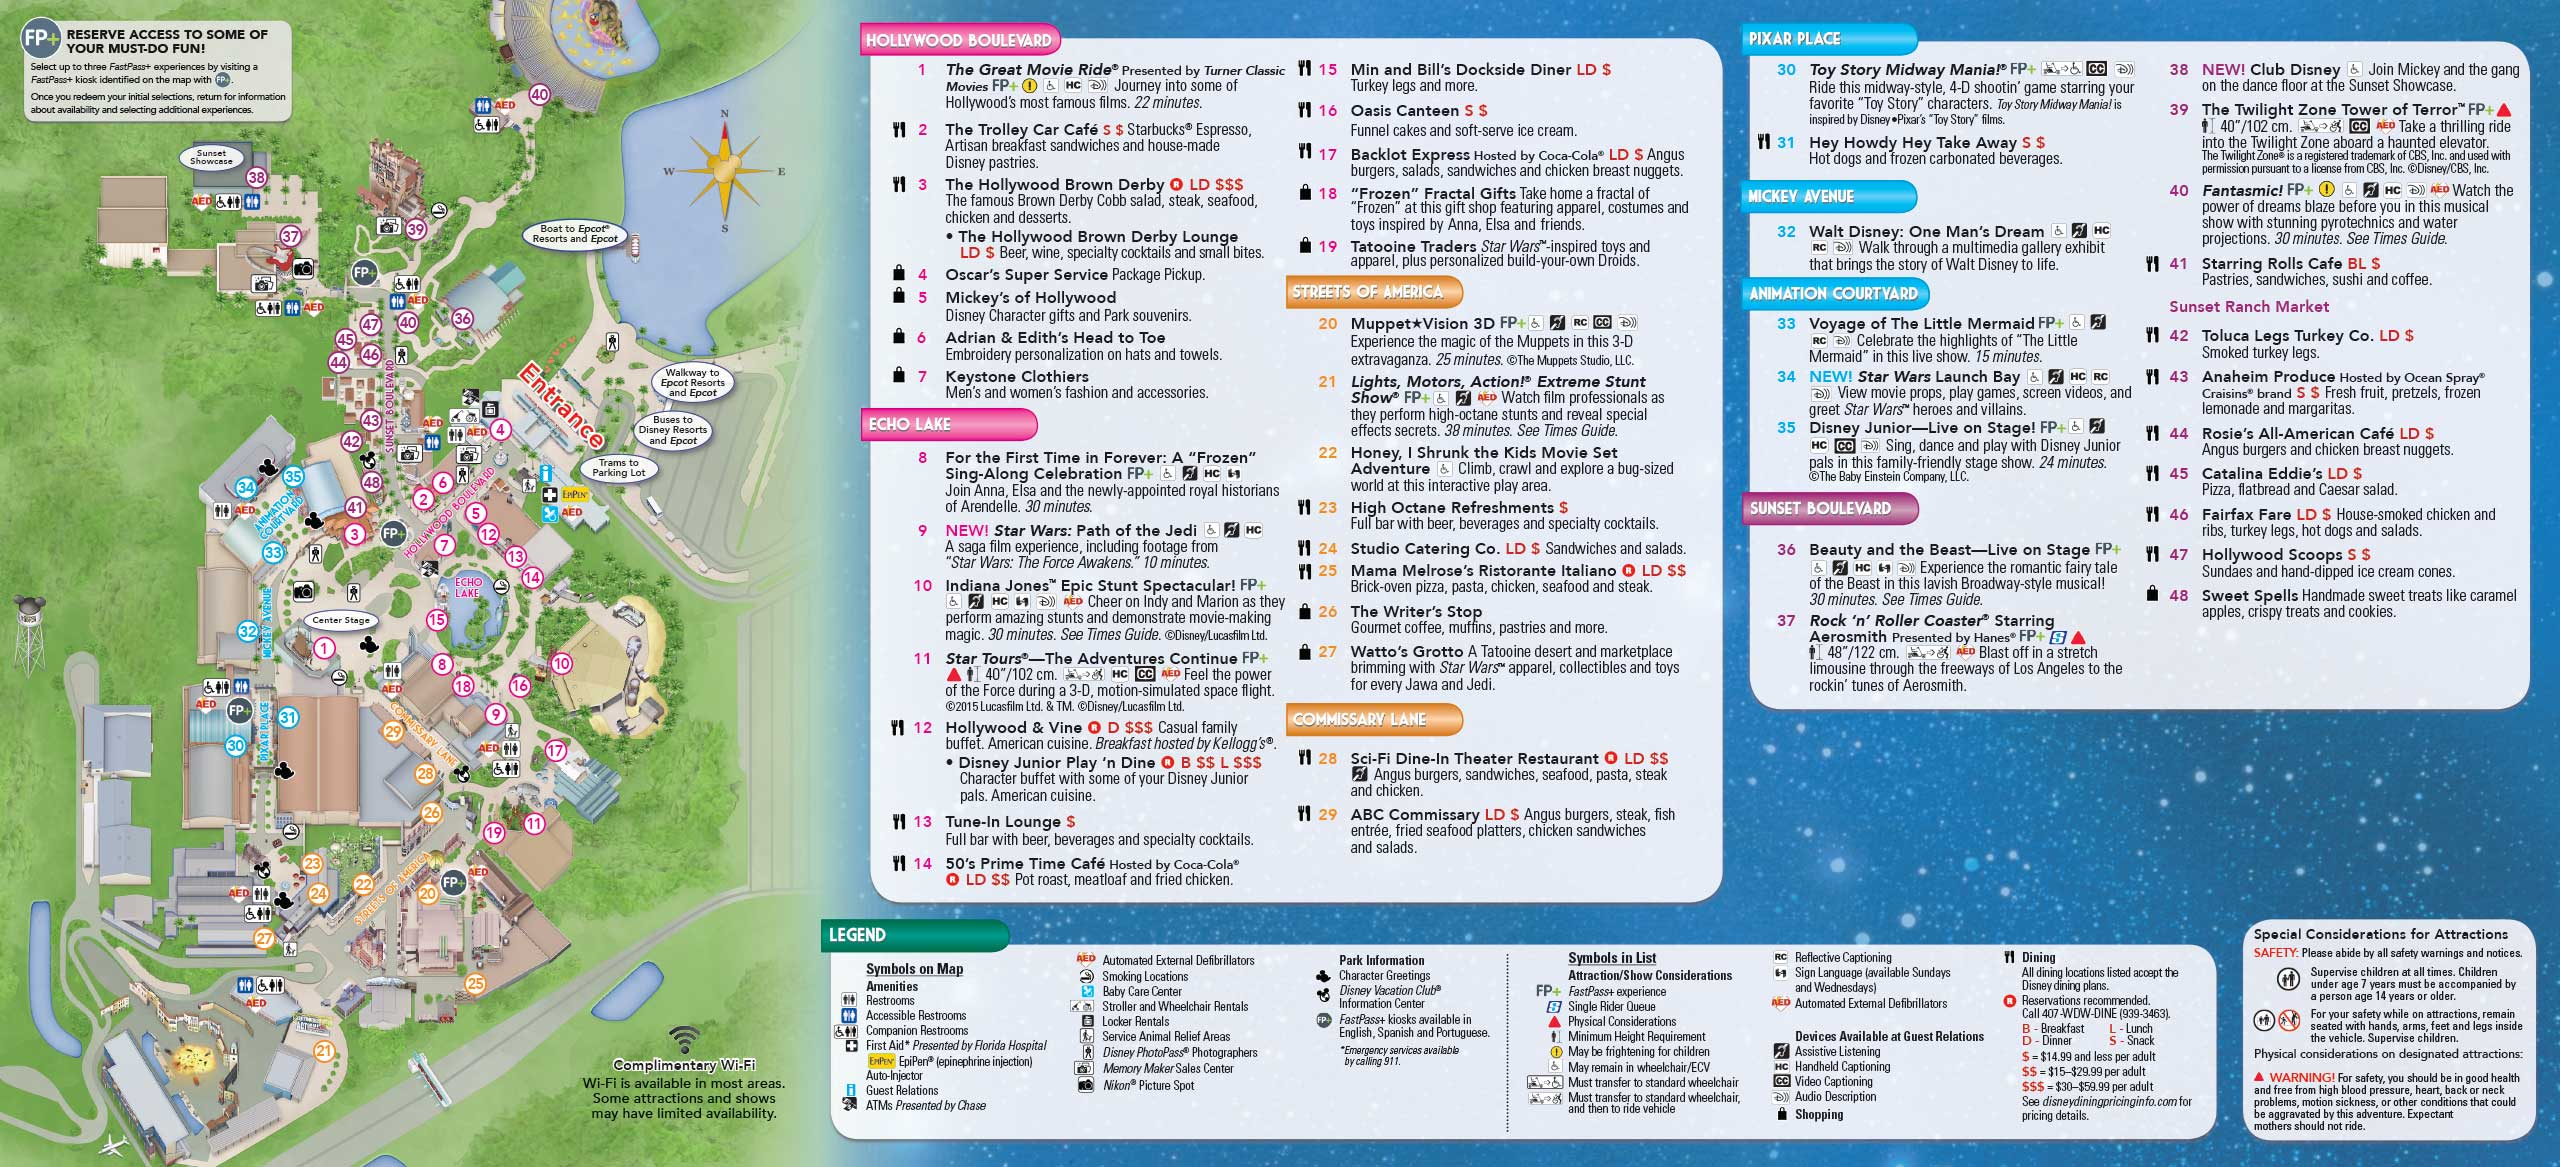 January 2016 Walt Disney World Park Maps - Photo 1 of 12